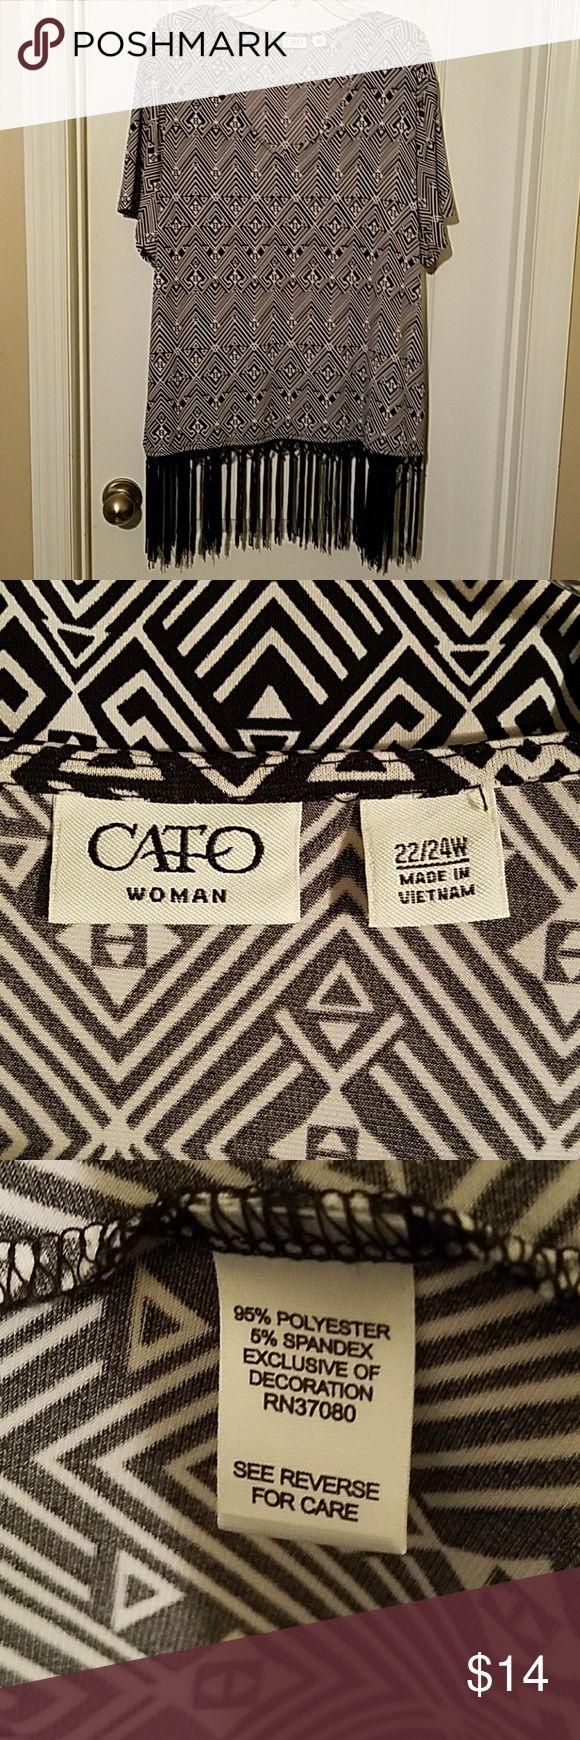 "🔷NWOT🔷BLACK/ WHITE PRINT TOP🔷SIZE 22/24 🔹Never worn!  🔹Tribal print top with fringe.  🔹95% Polyester 5% Spandex.  🔹Size 22/24. Bust 26.5"". 🔹Length (not including fringe) 26.5"". 🔹Fringe 7"" Cato Tops"